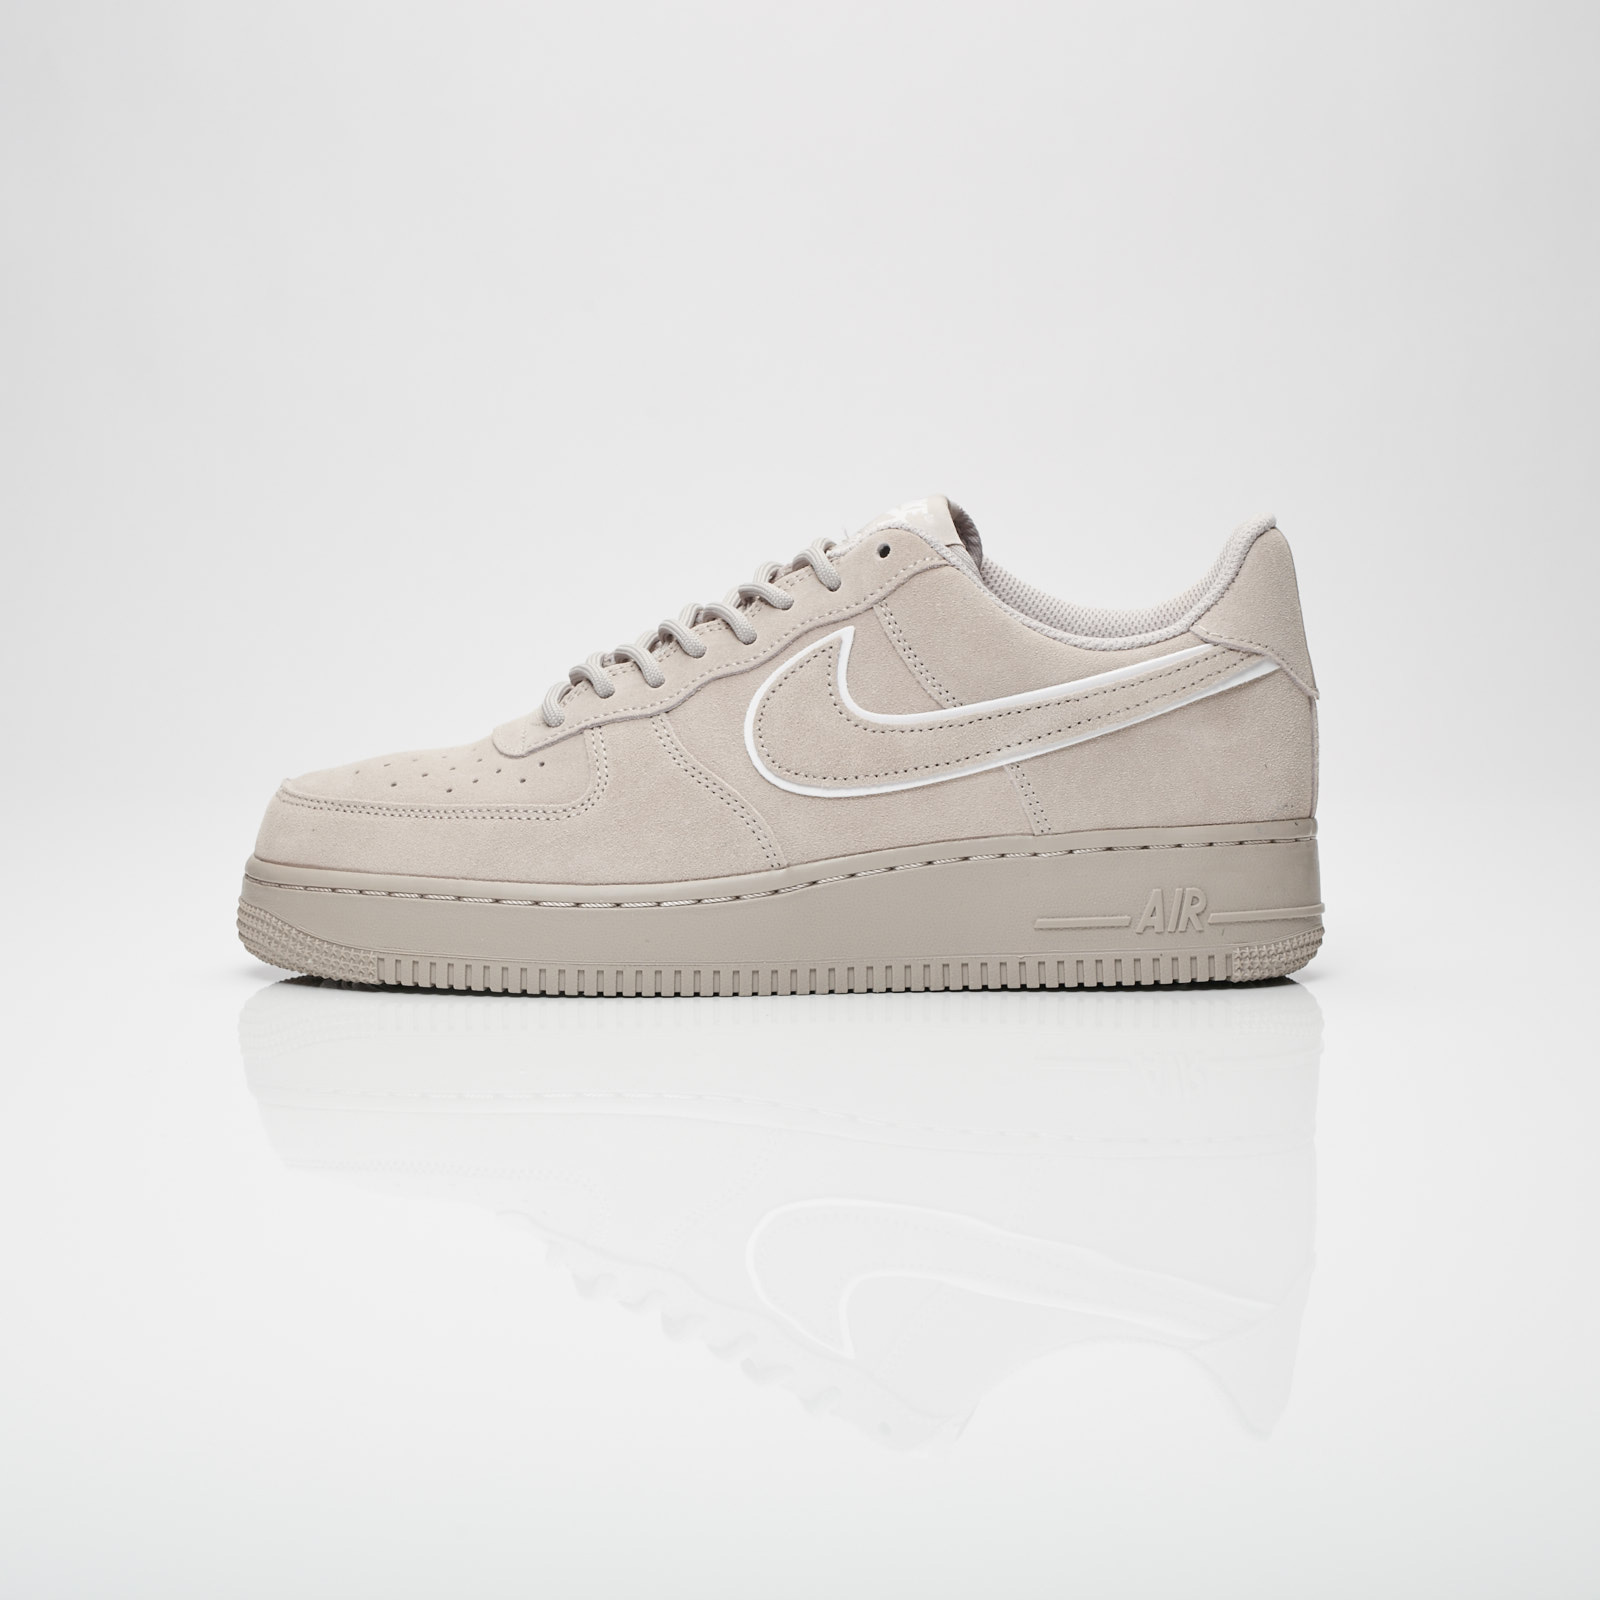 new styles cae2c e443b Nike Air Force 1 07 lv8 Suede - Aa1117-201 - Sneakersnstuff   sneakers    streetwear online since 1999